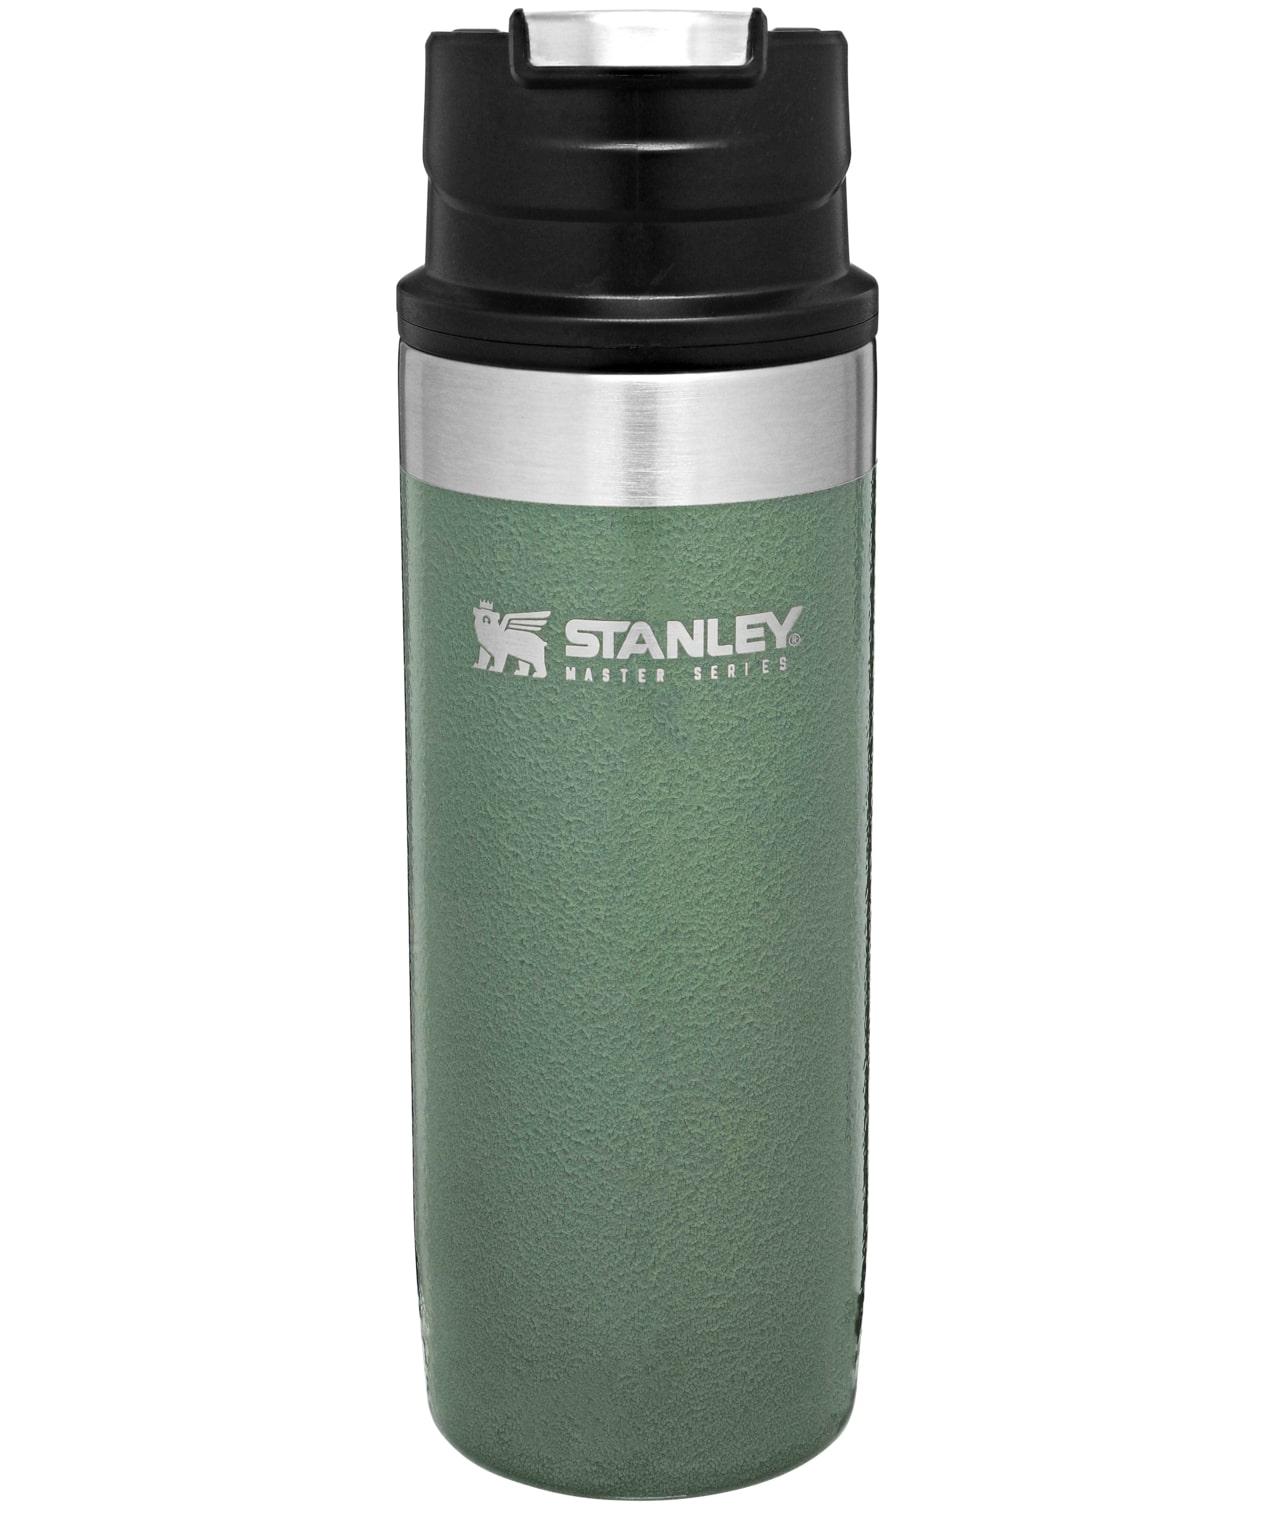 Bình giữ nhiệt Stanley Master Unbreakable Trigger Action Mug 16oz | 470ml